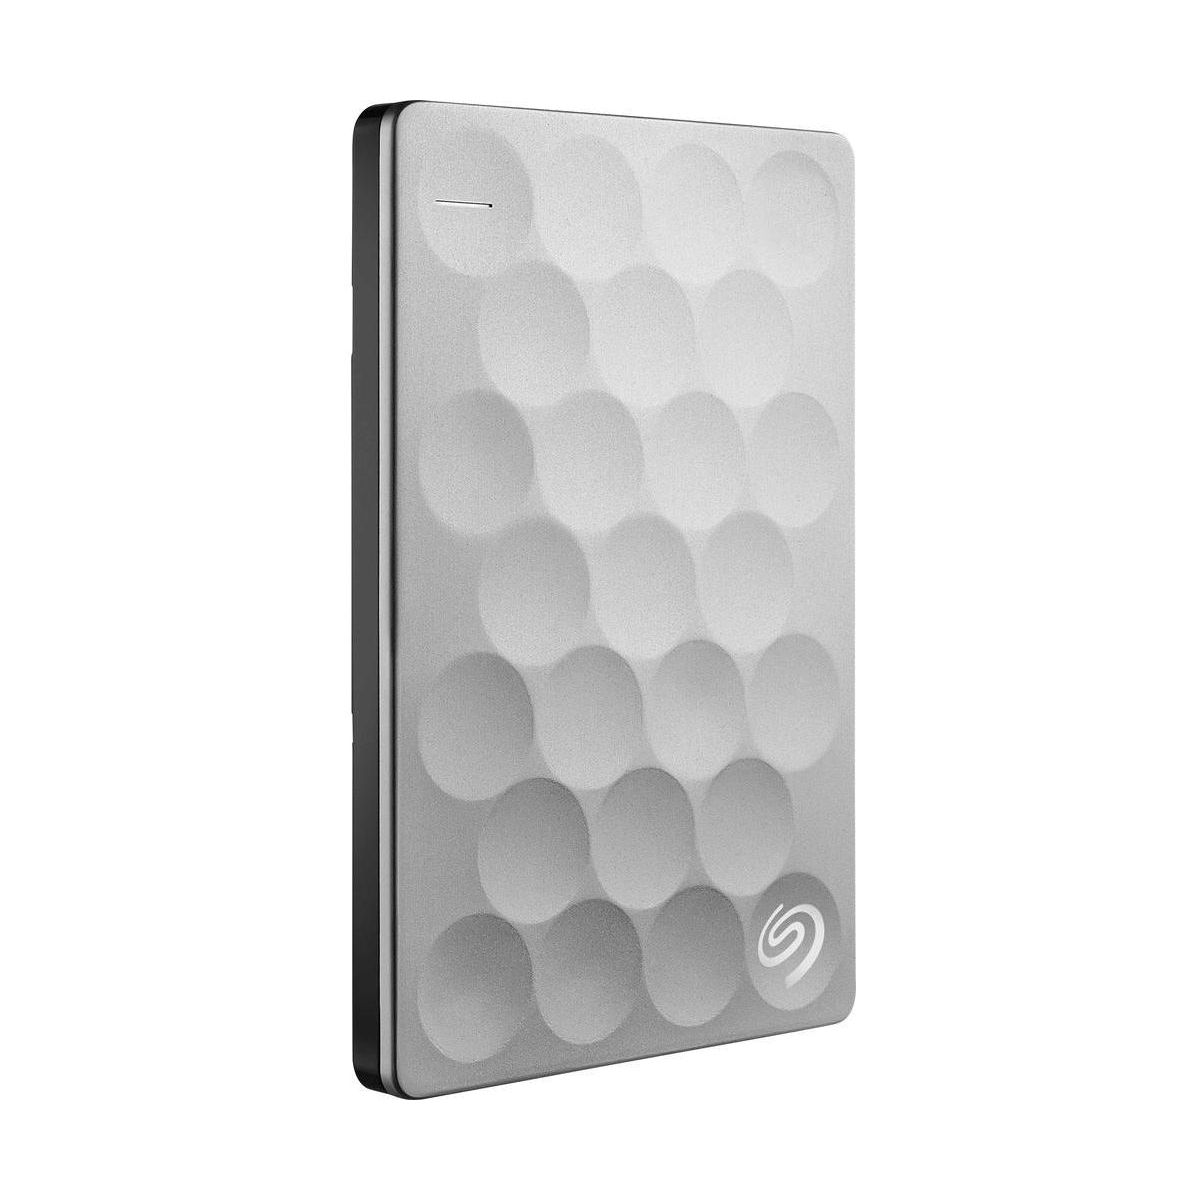 Disque dur externe de poche SEAGATE 2,5 1To Ultra Slim / Titanium / USB 3.0